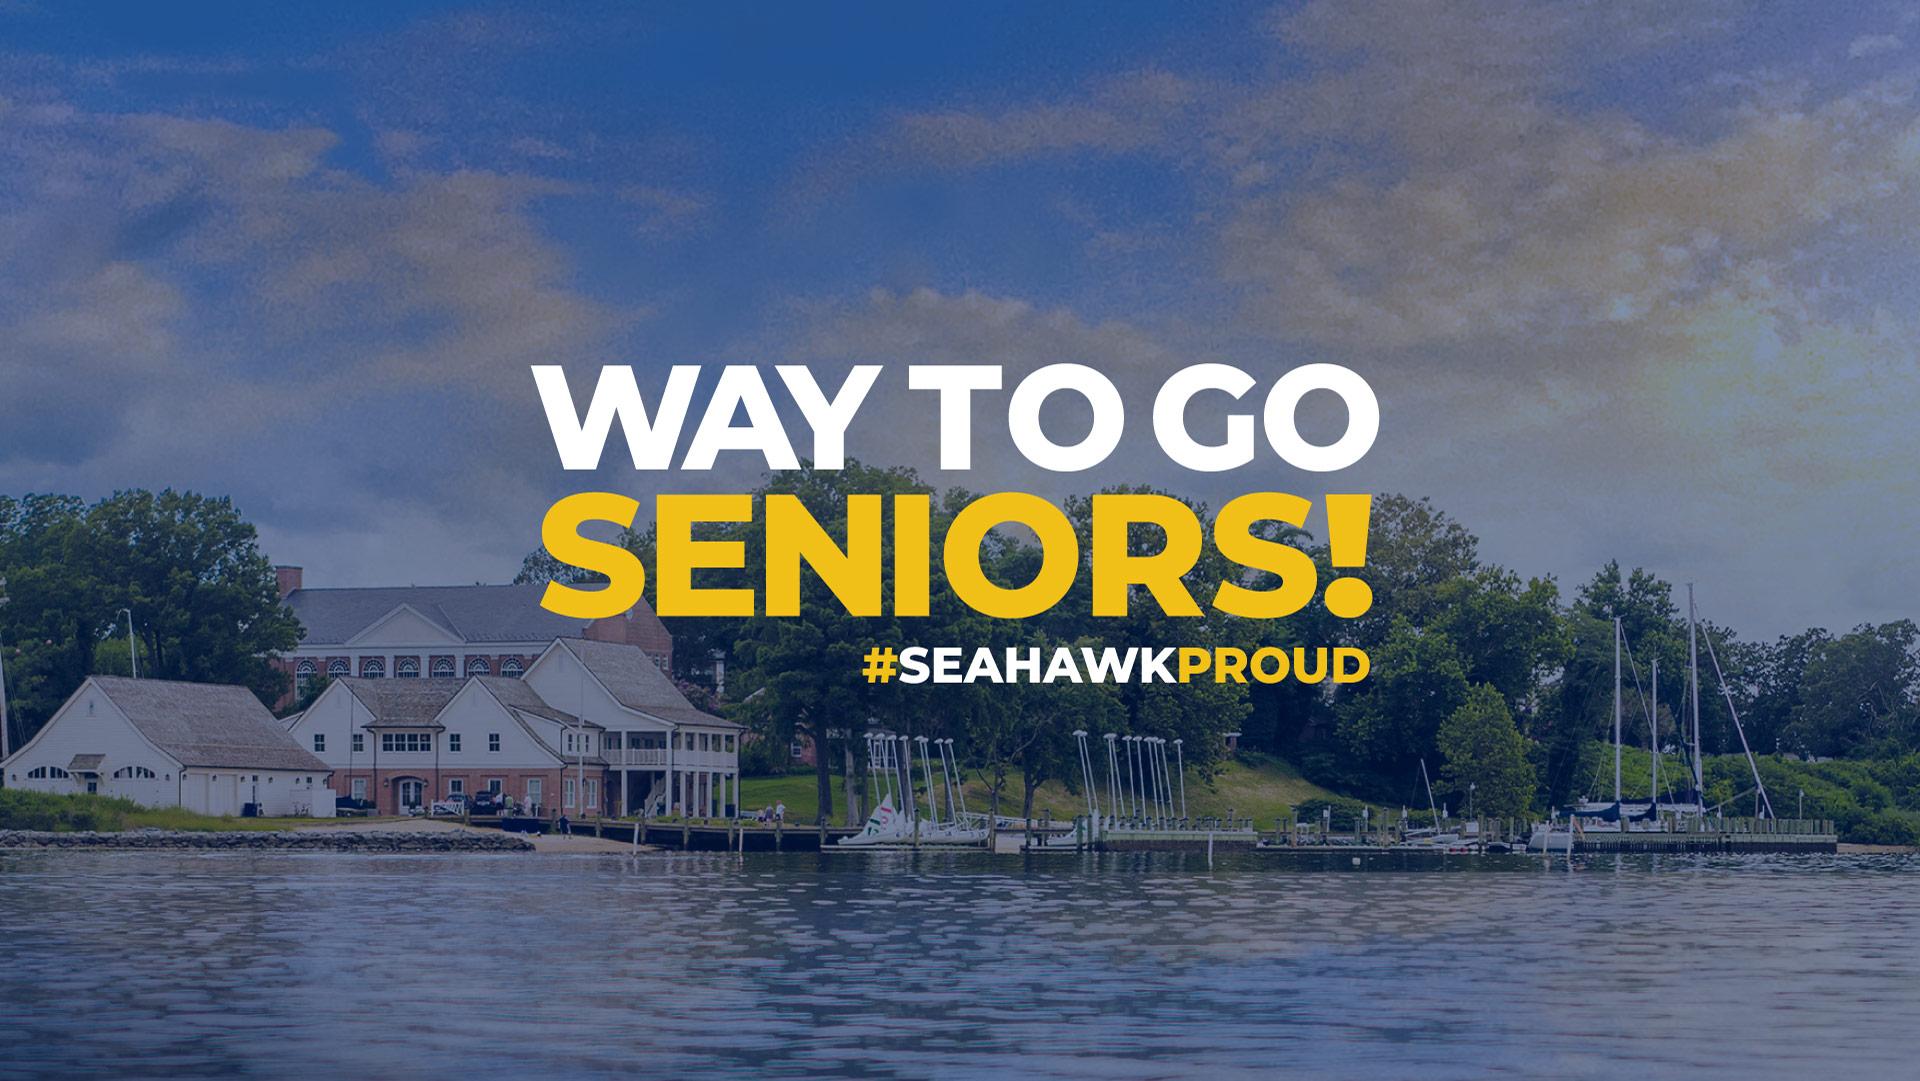 Way to Go Seniors! #seahawkproud slide